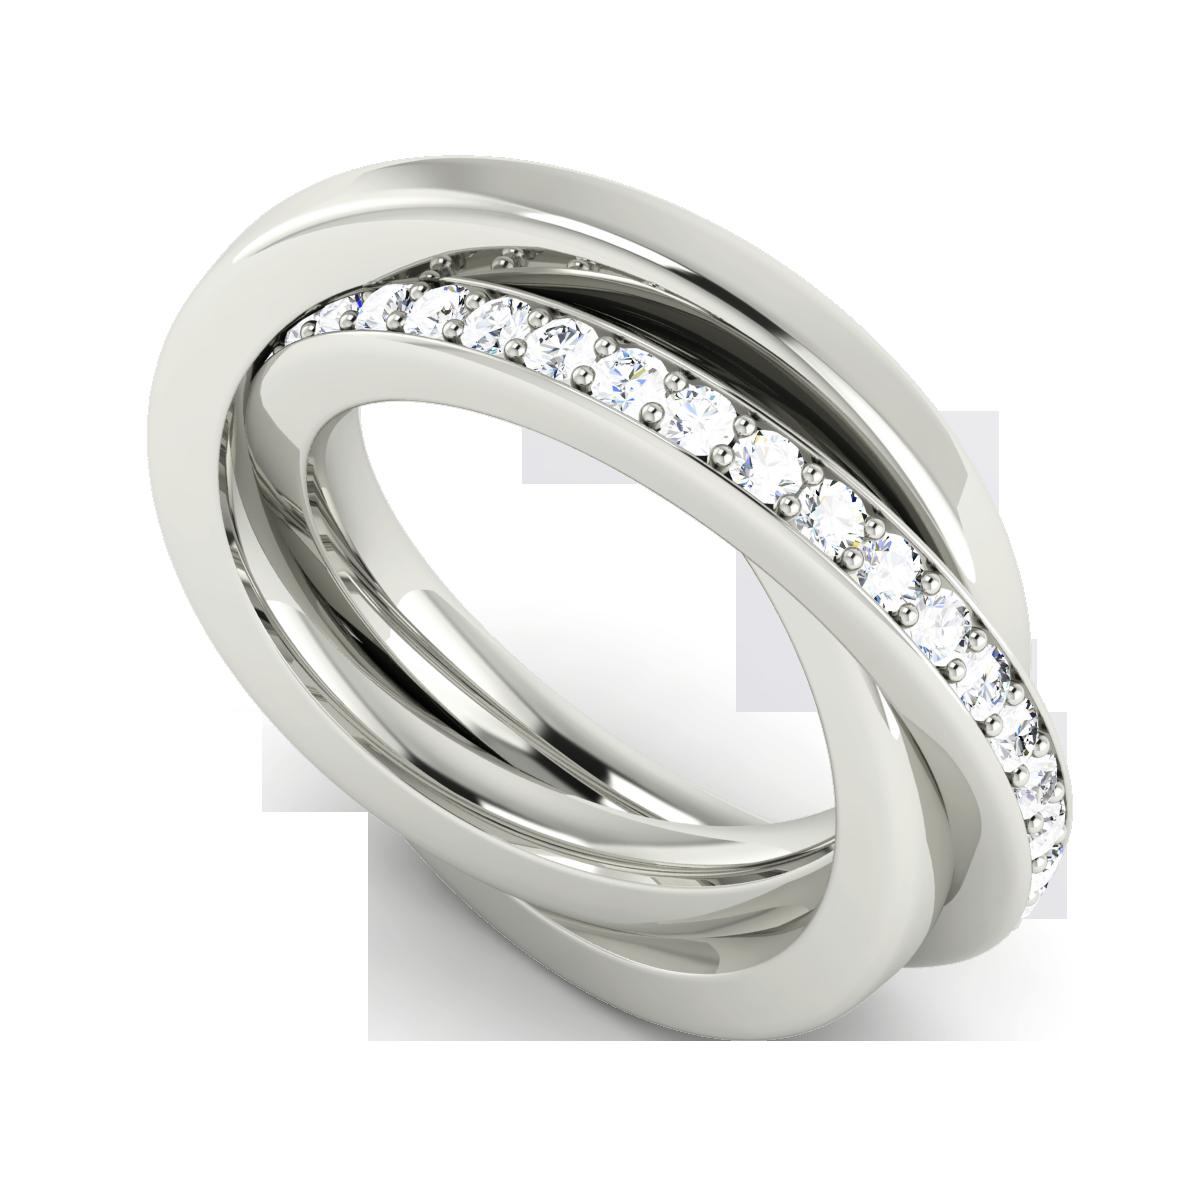 russian wedding ring Stunning Diamond Russian Wedding Ring in 9ct White Gold from StyleRocks